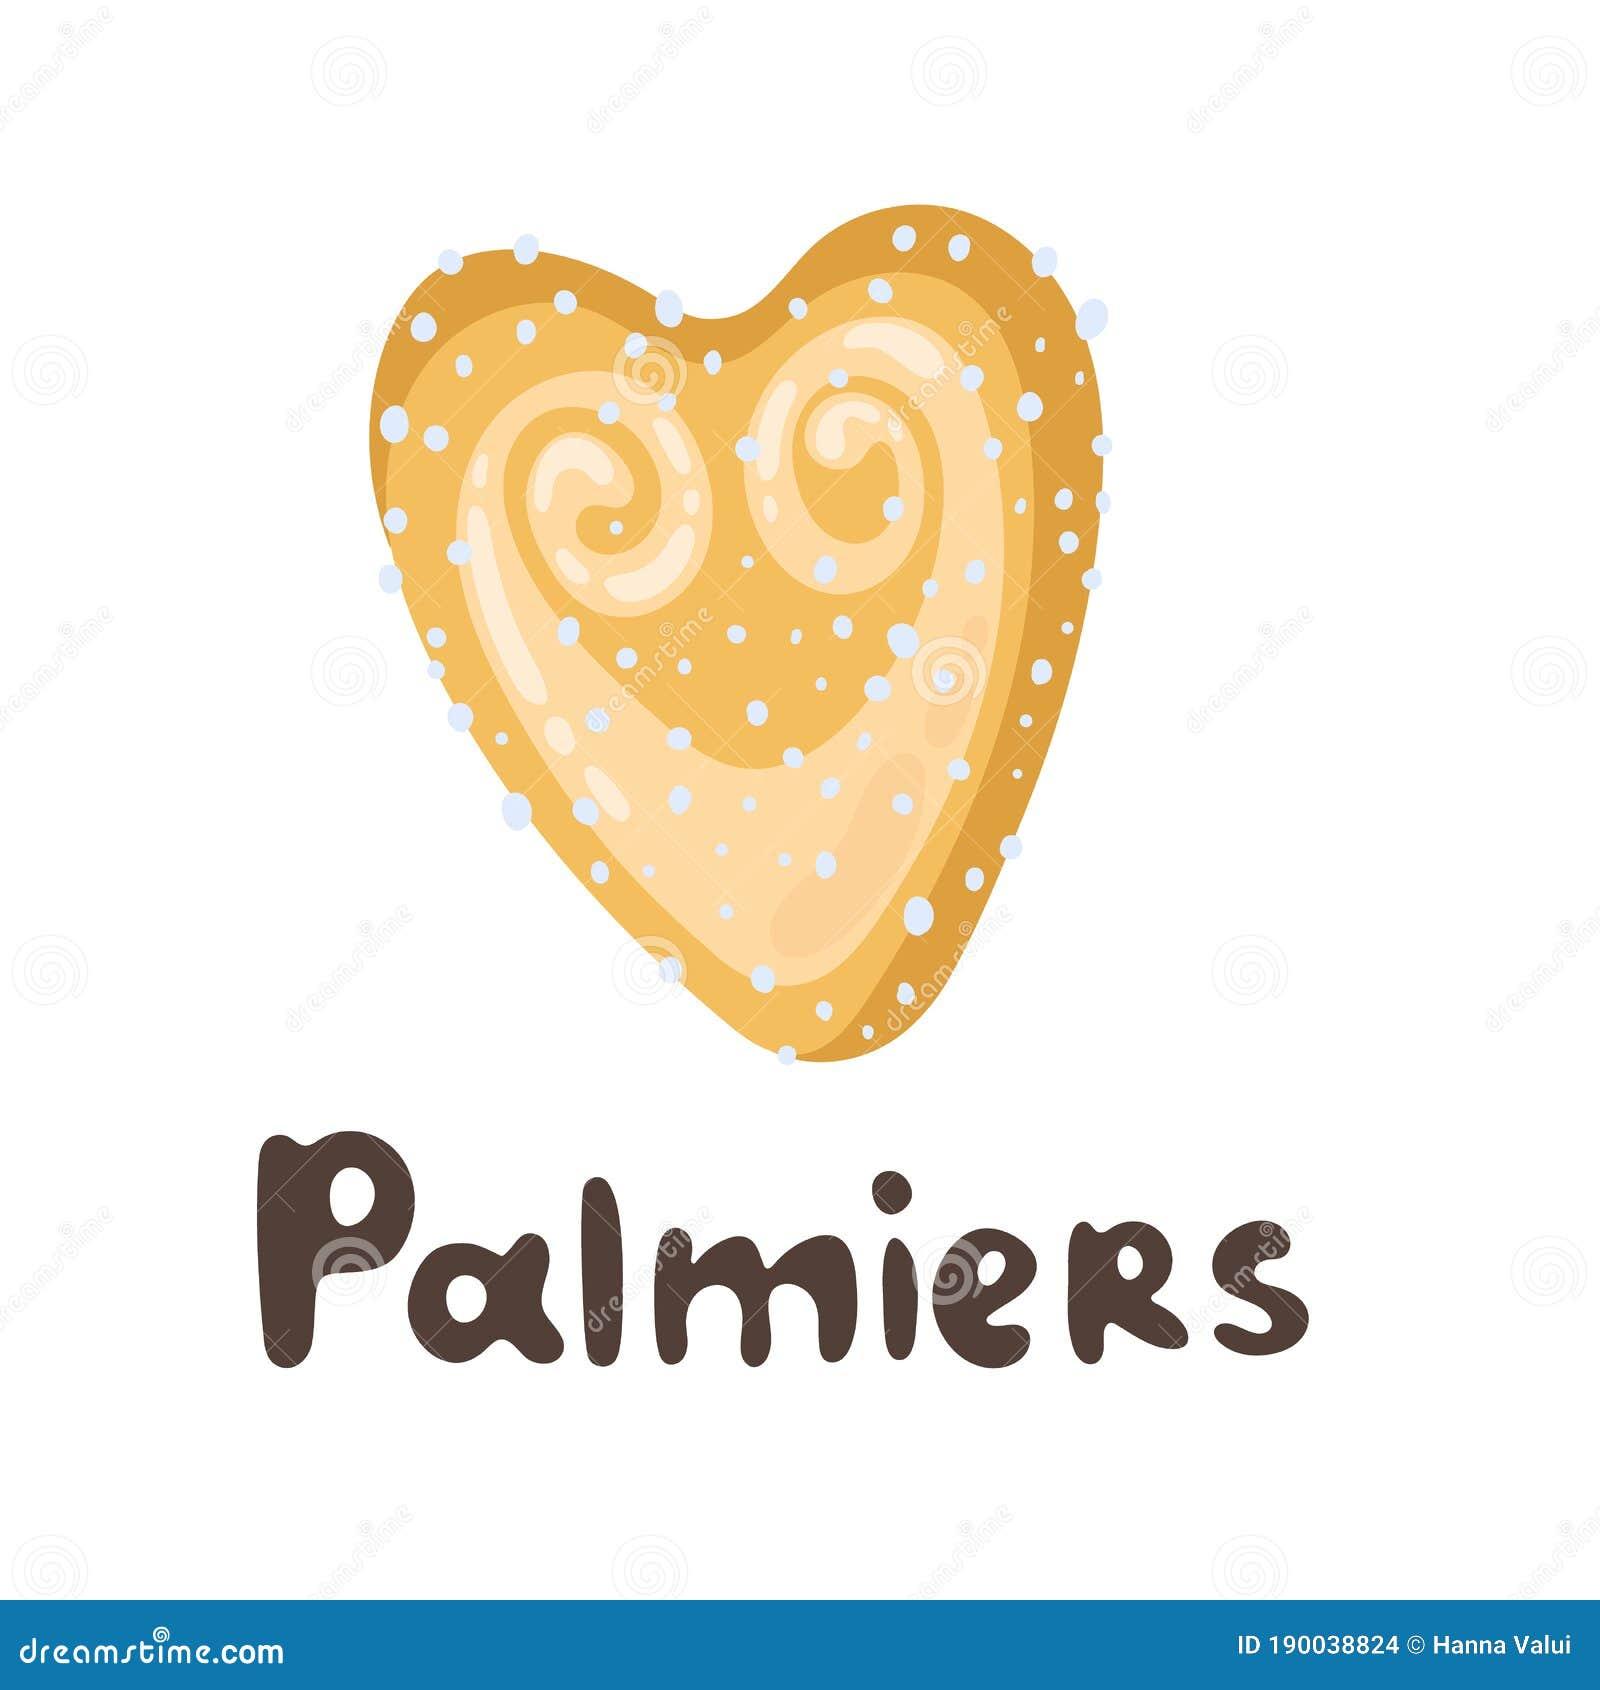 Palmier Stock Illustrations 47 Palmier Stock Illustrations Vectors Clipart Dreamstime